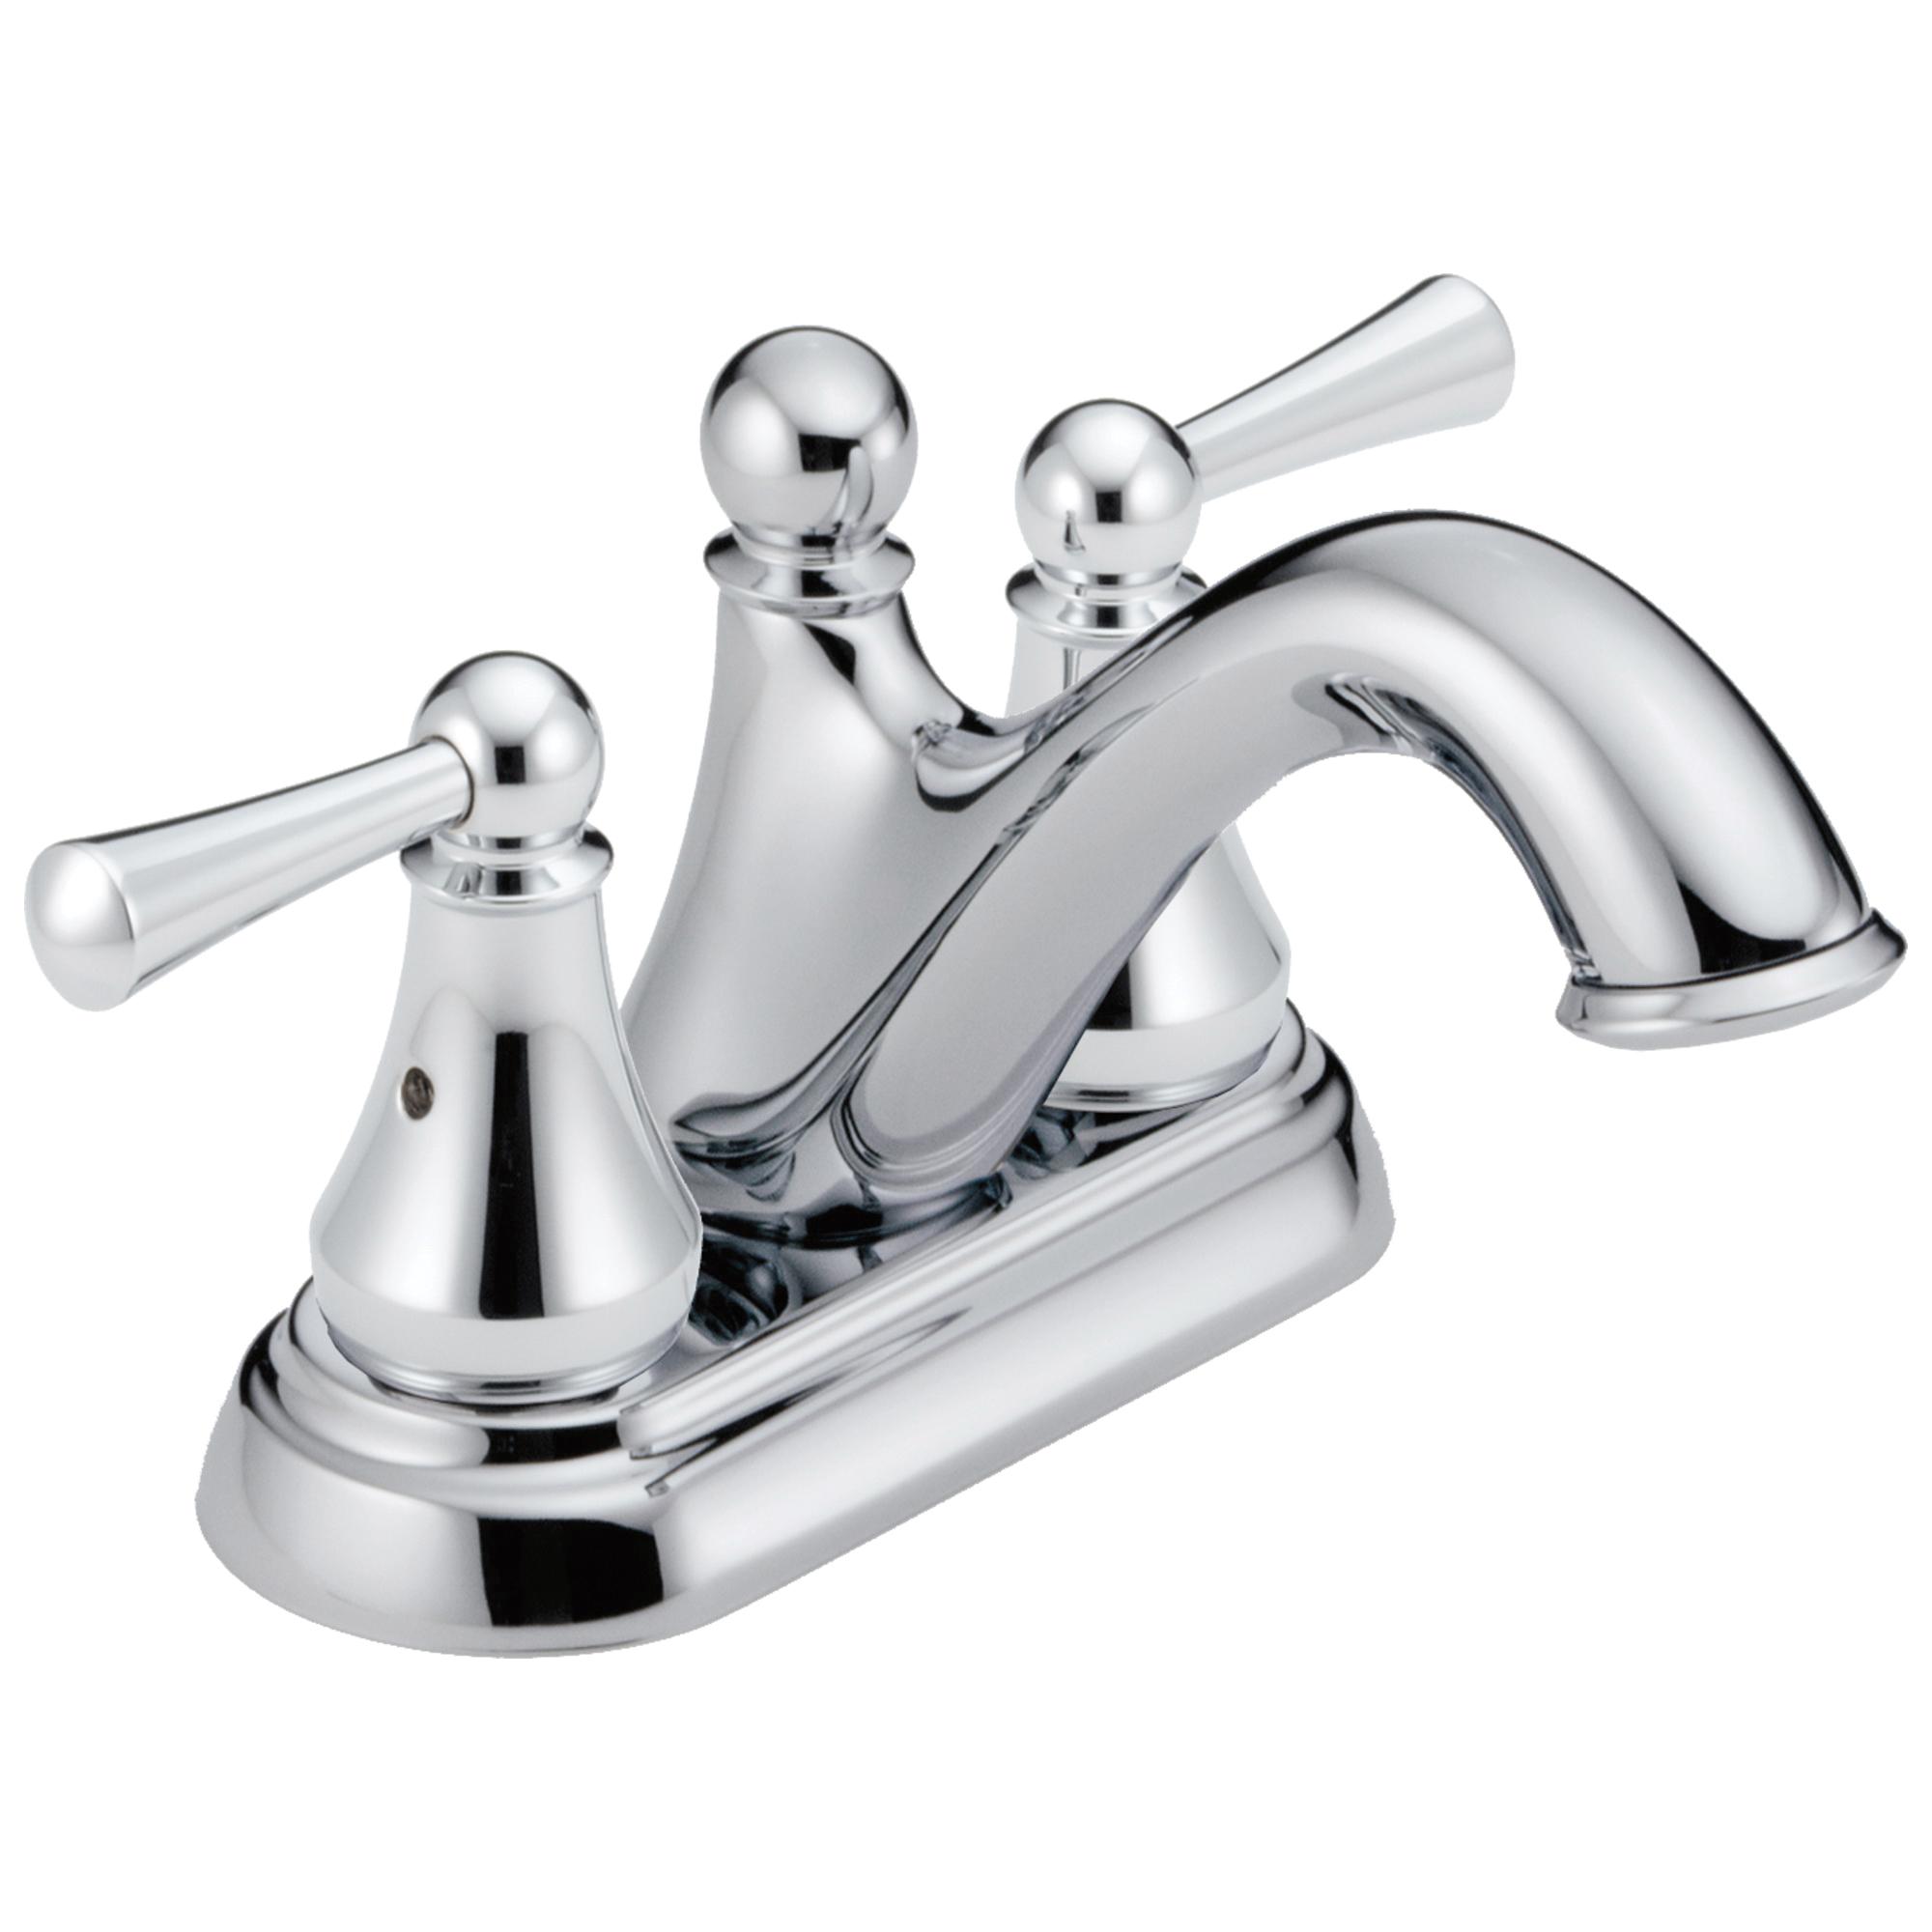 DELTA® 25999LF Centerset Lavatory Faucet, Haywood™, Chrome Plated, 2 Handles, Plastic Pop-Up Drain, 1.2 gpm